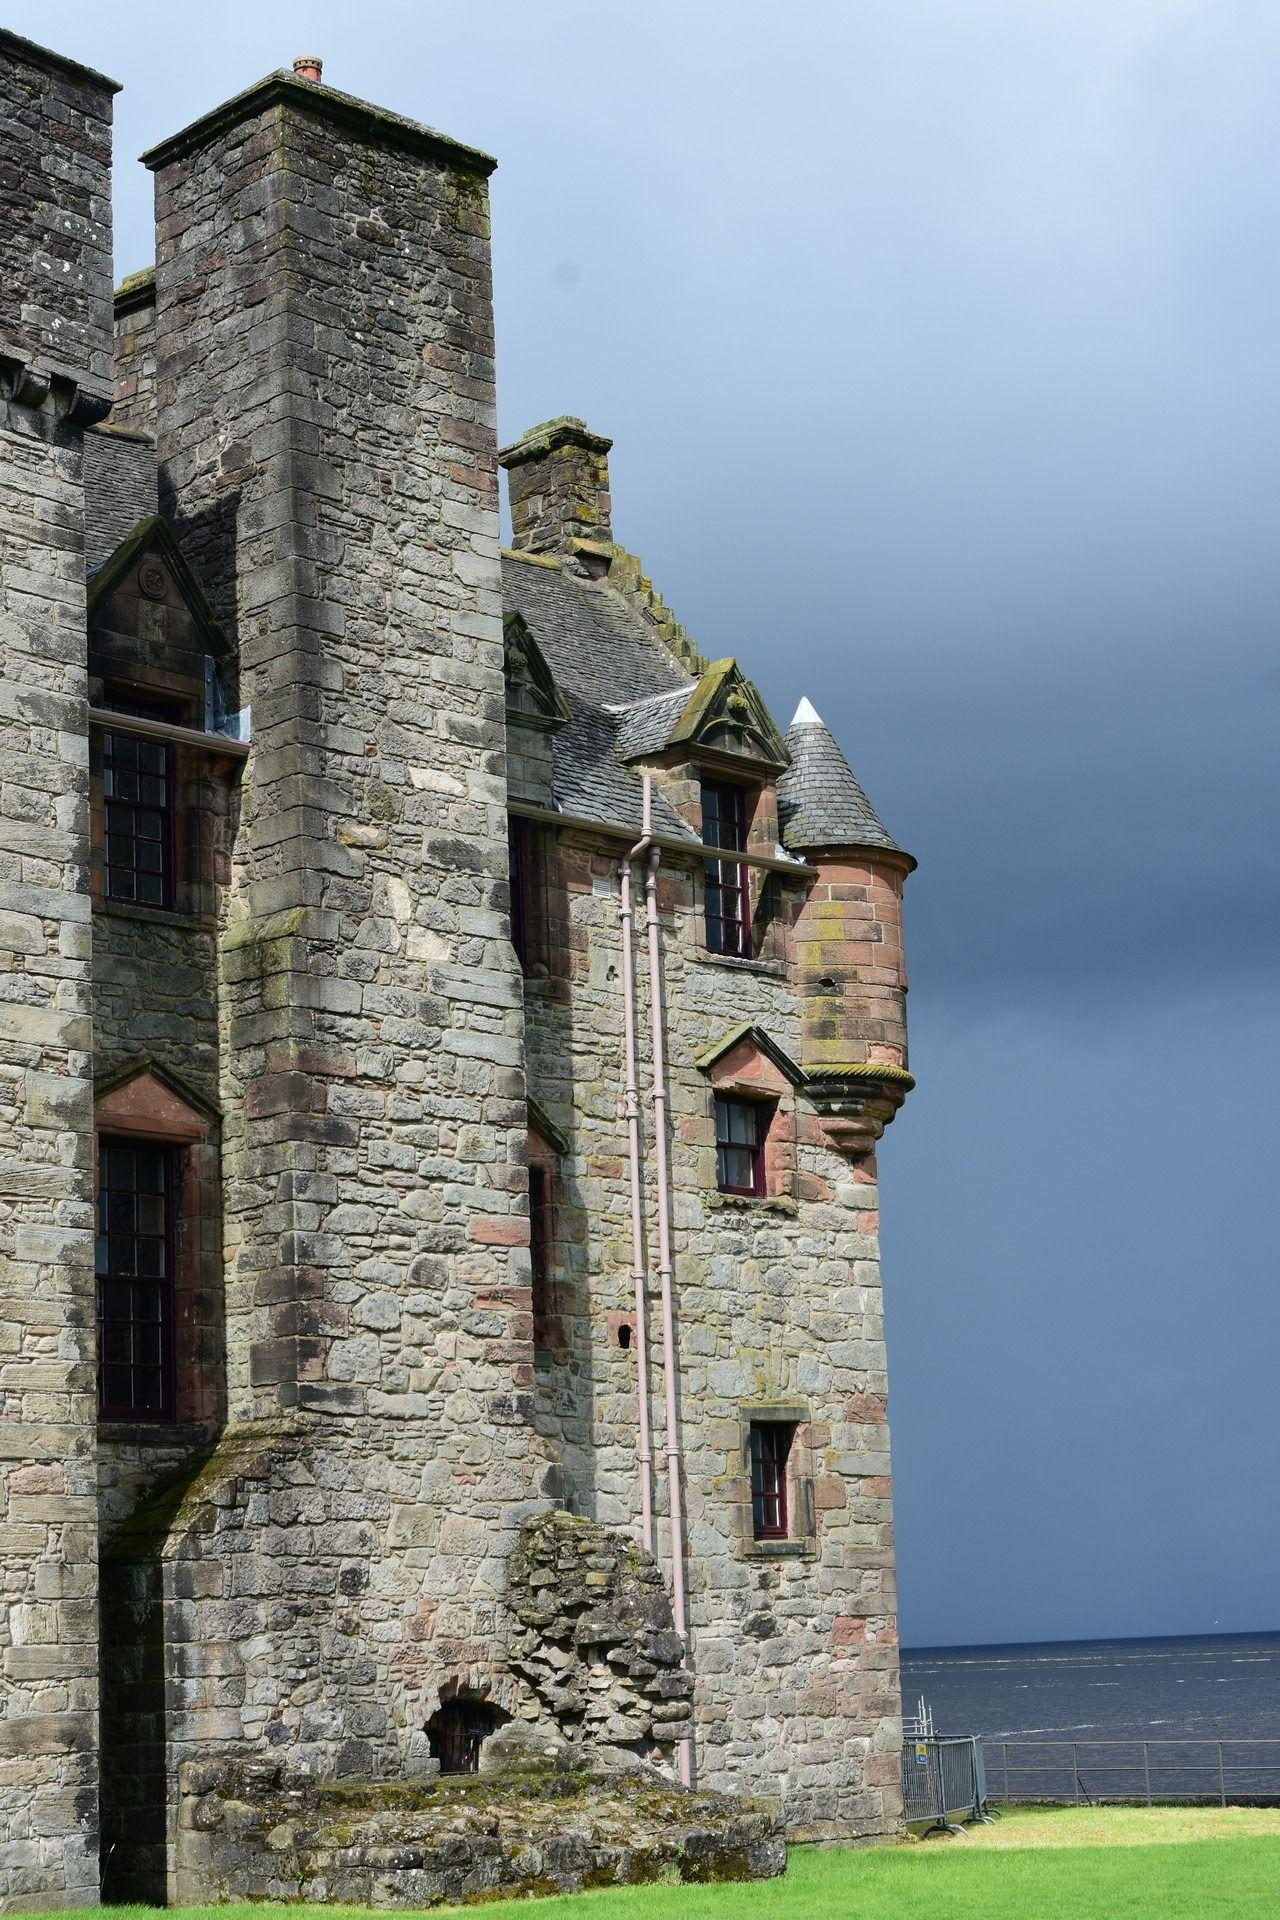 Scotland 2019 – day 2, Newark, Dumbarton and Inveraray Castles and Old Kingdoms